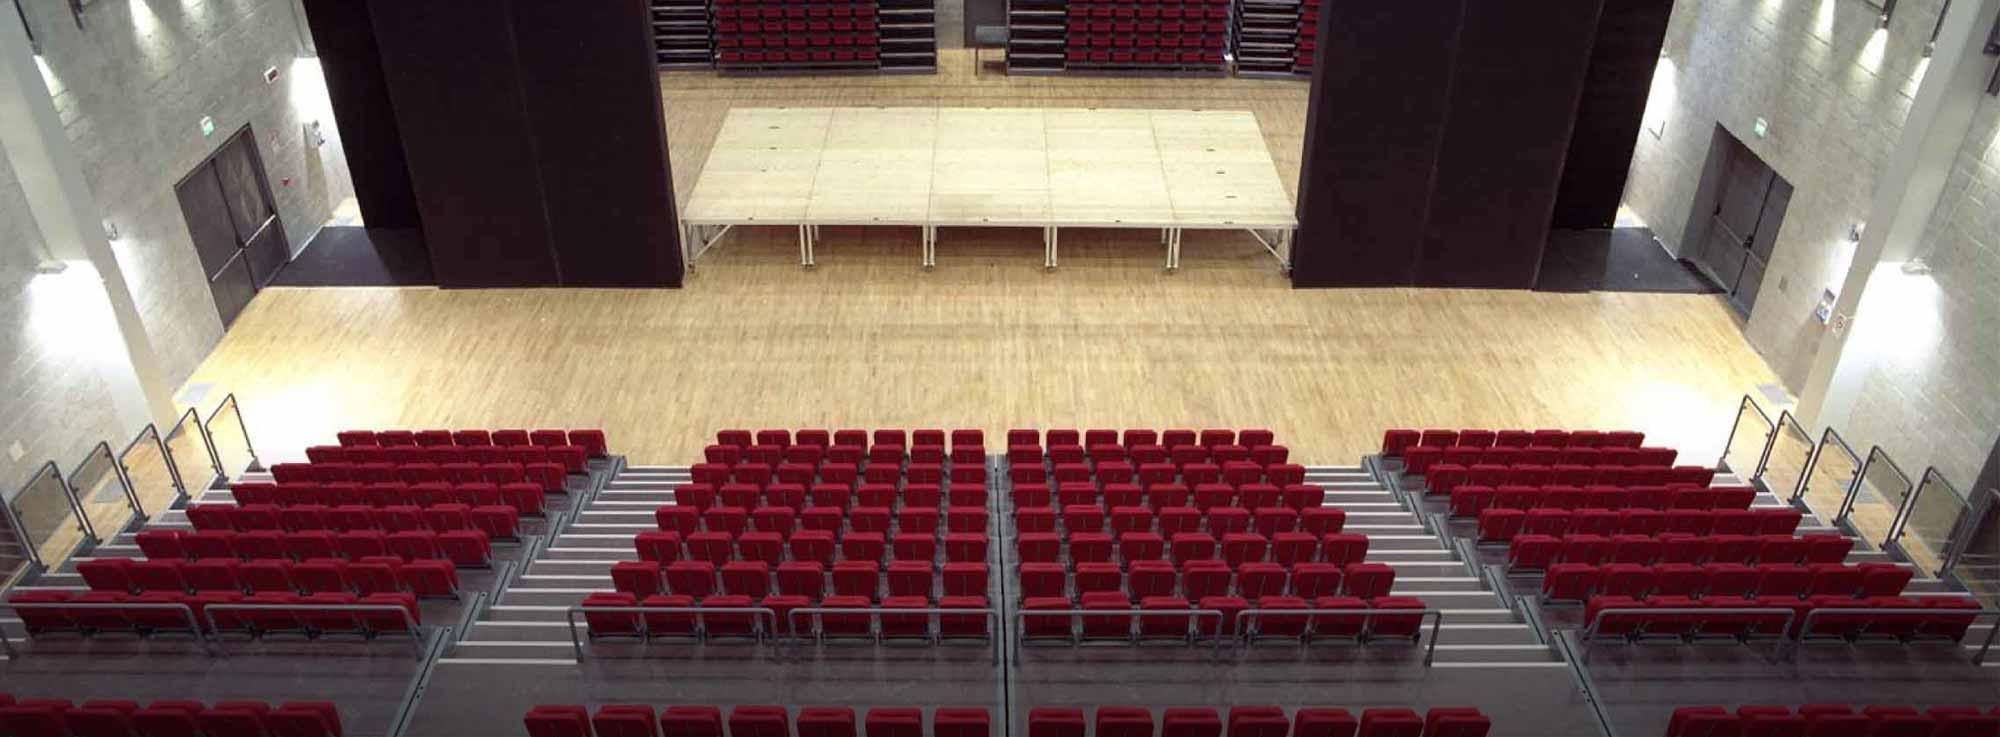 Foggia: XII rassegna teatrale